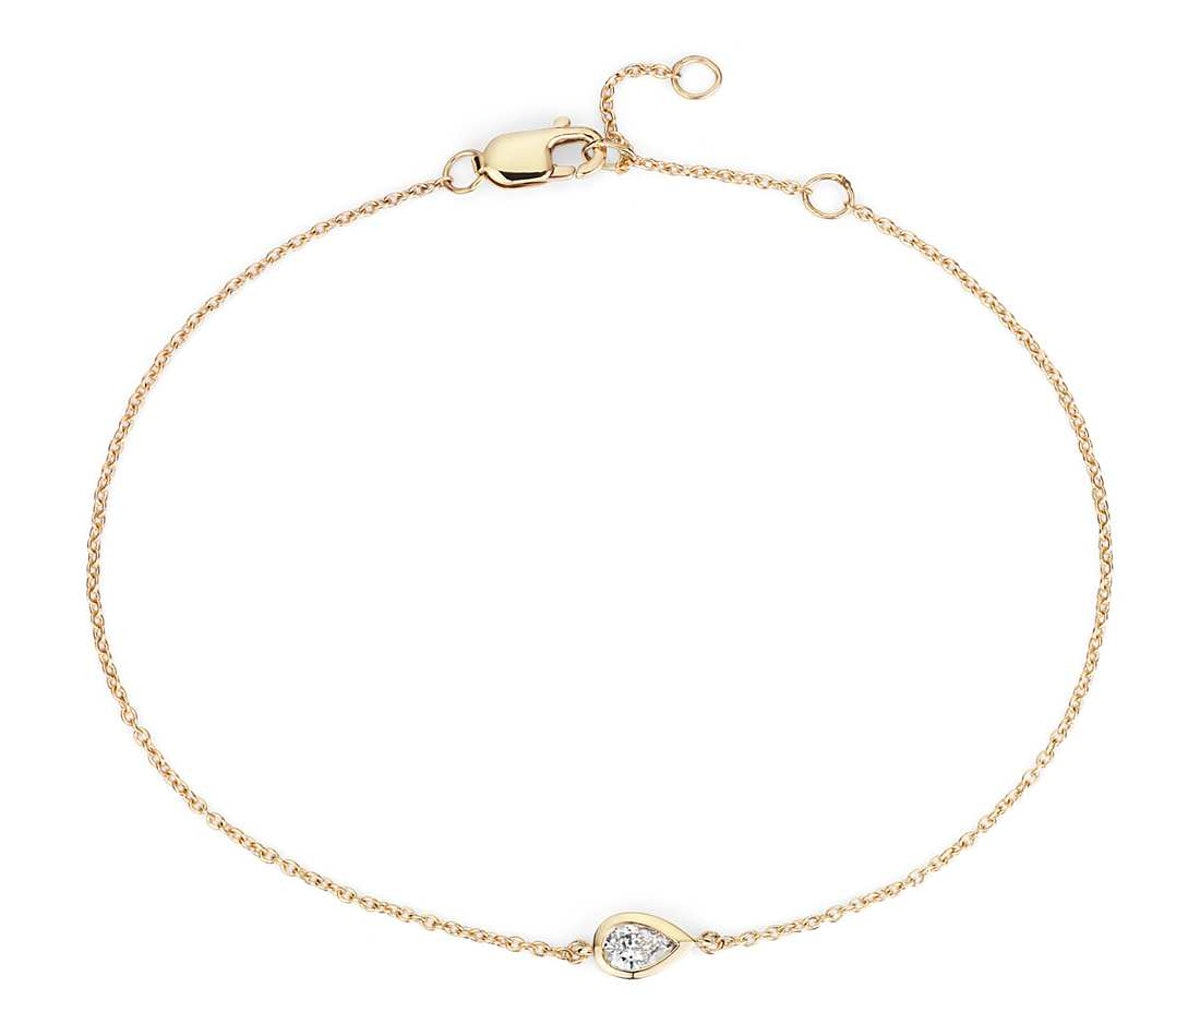 Mini Bezel Set Pear Cut Diamond Bracelet